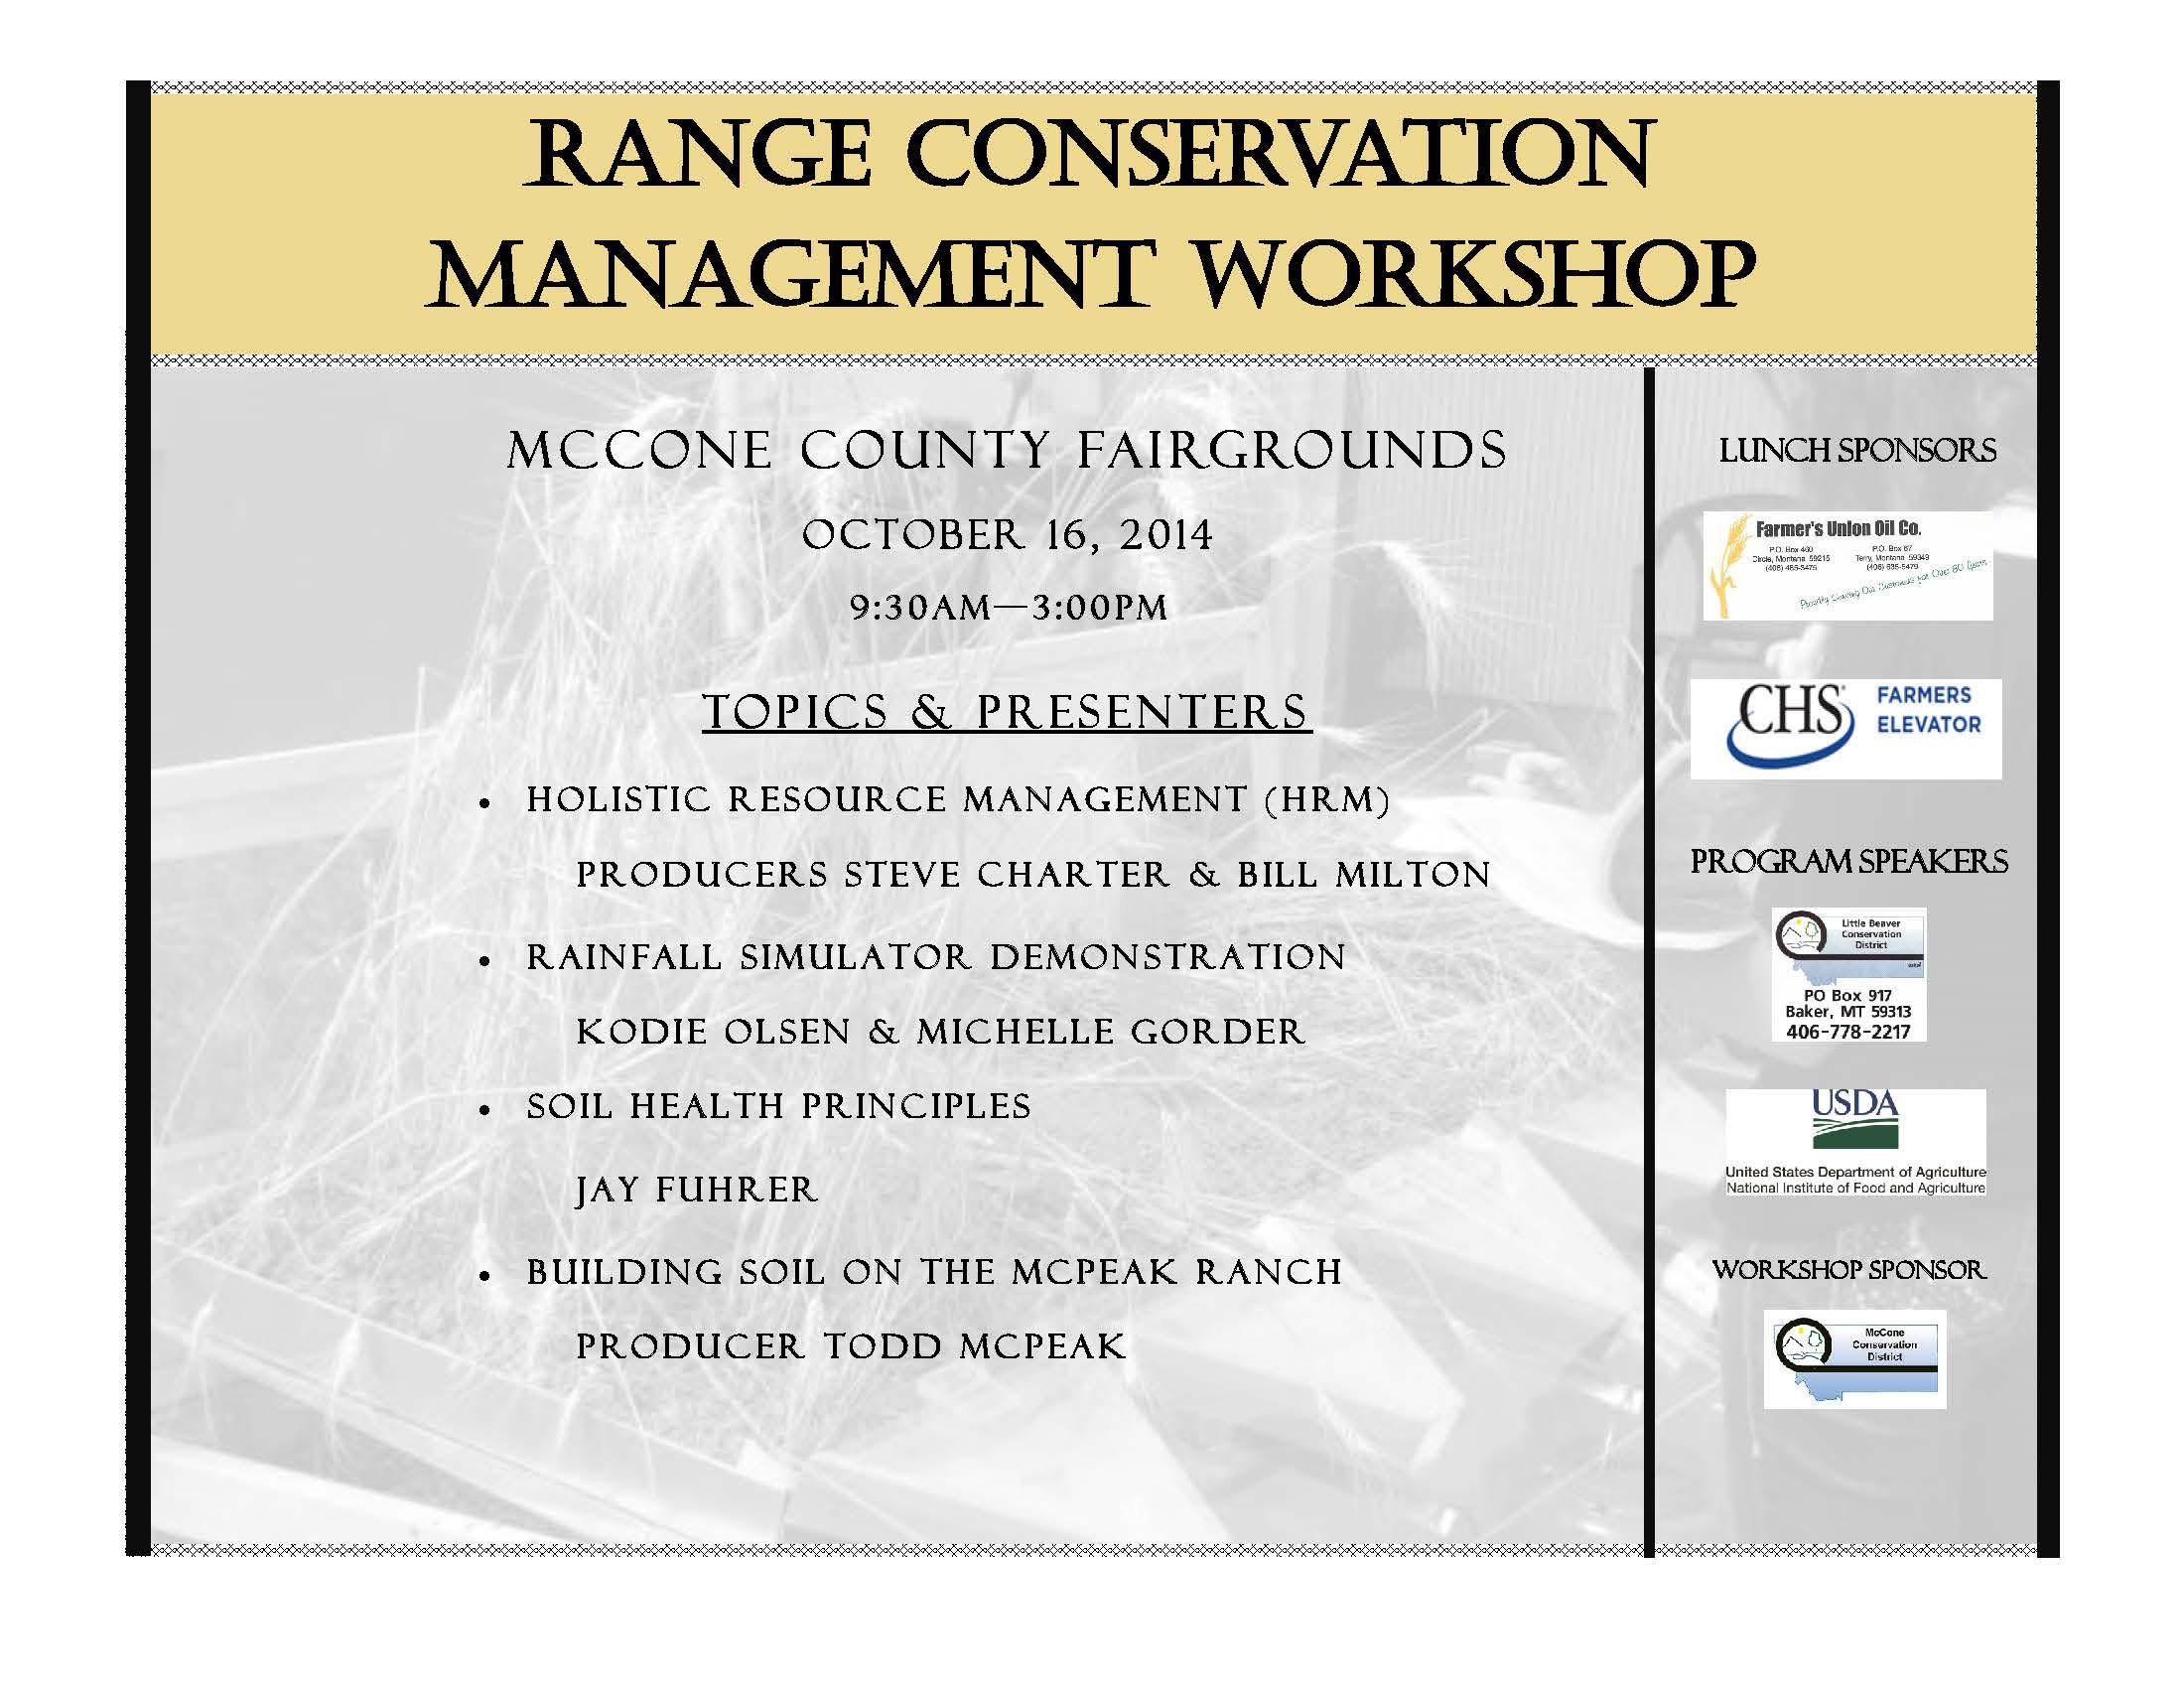 Montana mccone county brockway - October 16th Workshop In Circle